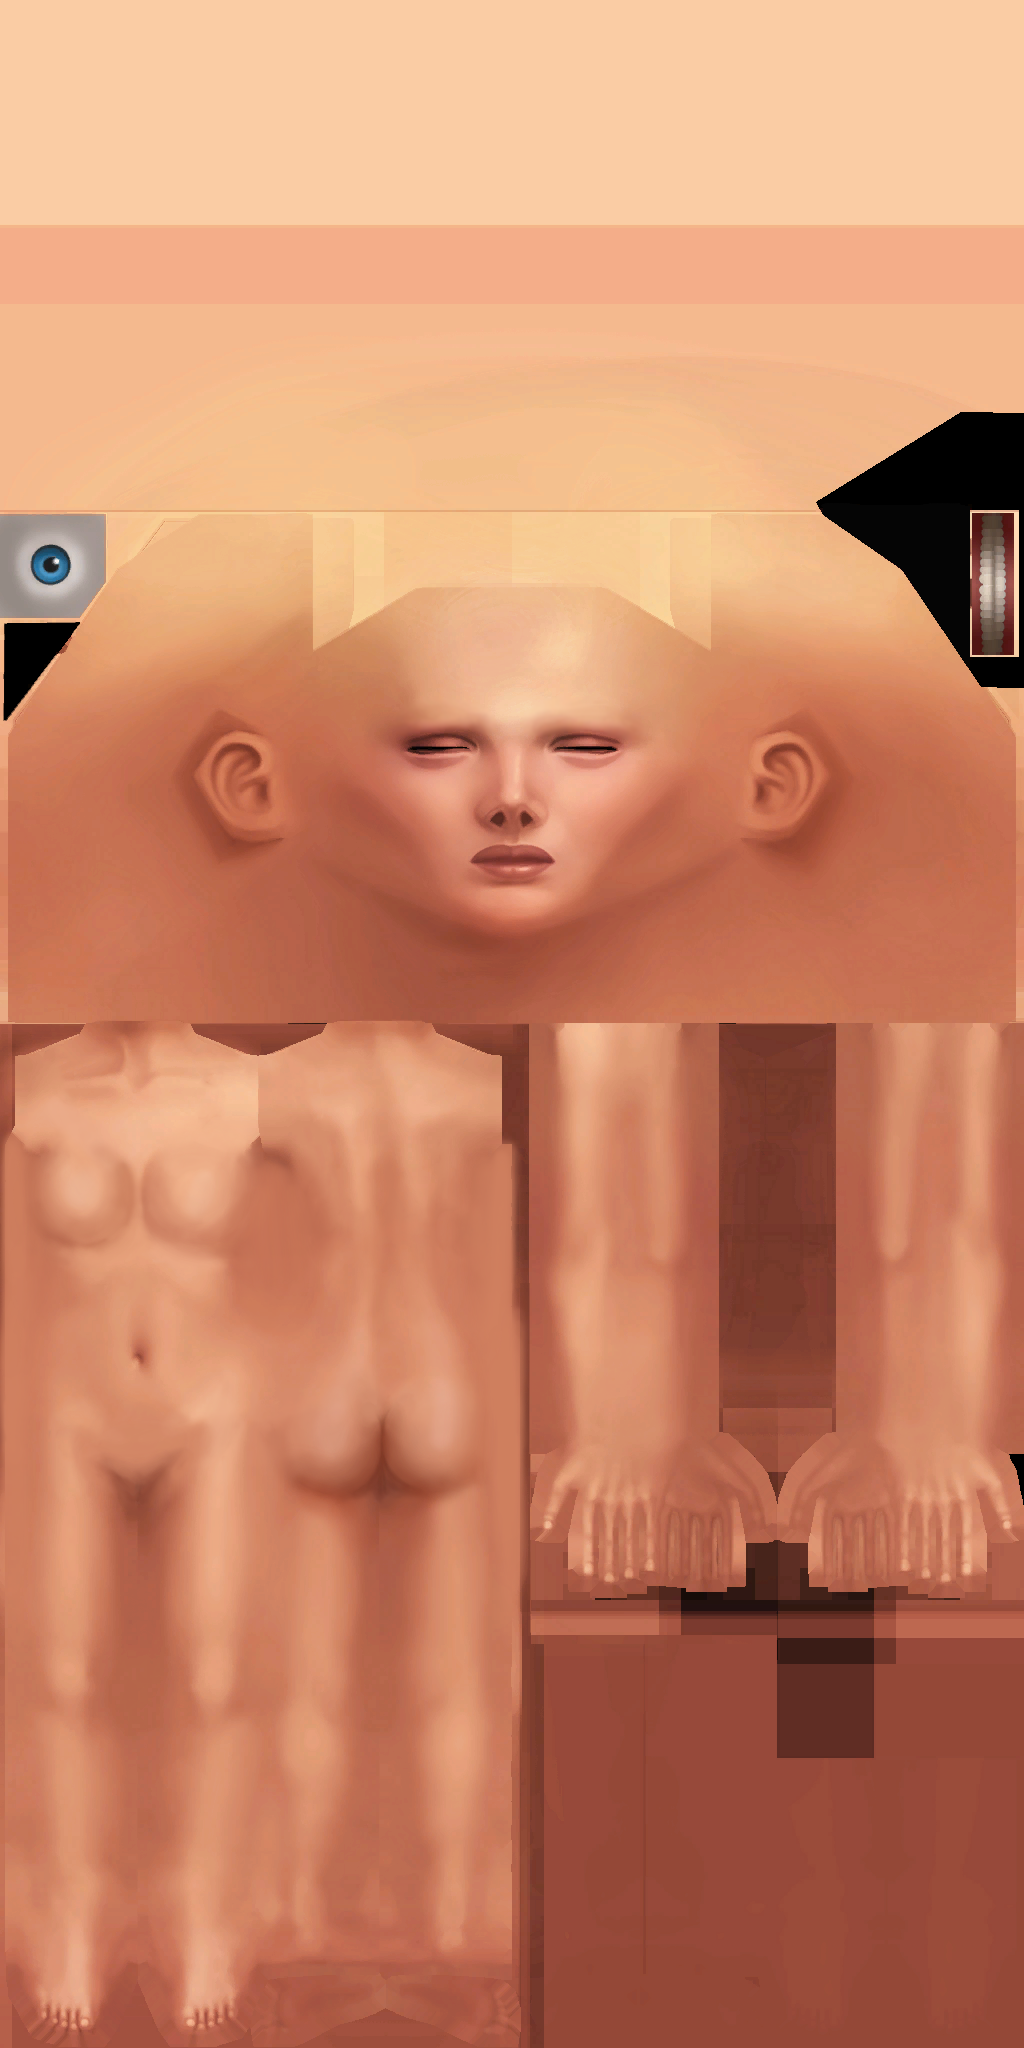 Edited sims 4 skin template female adult